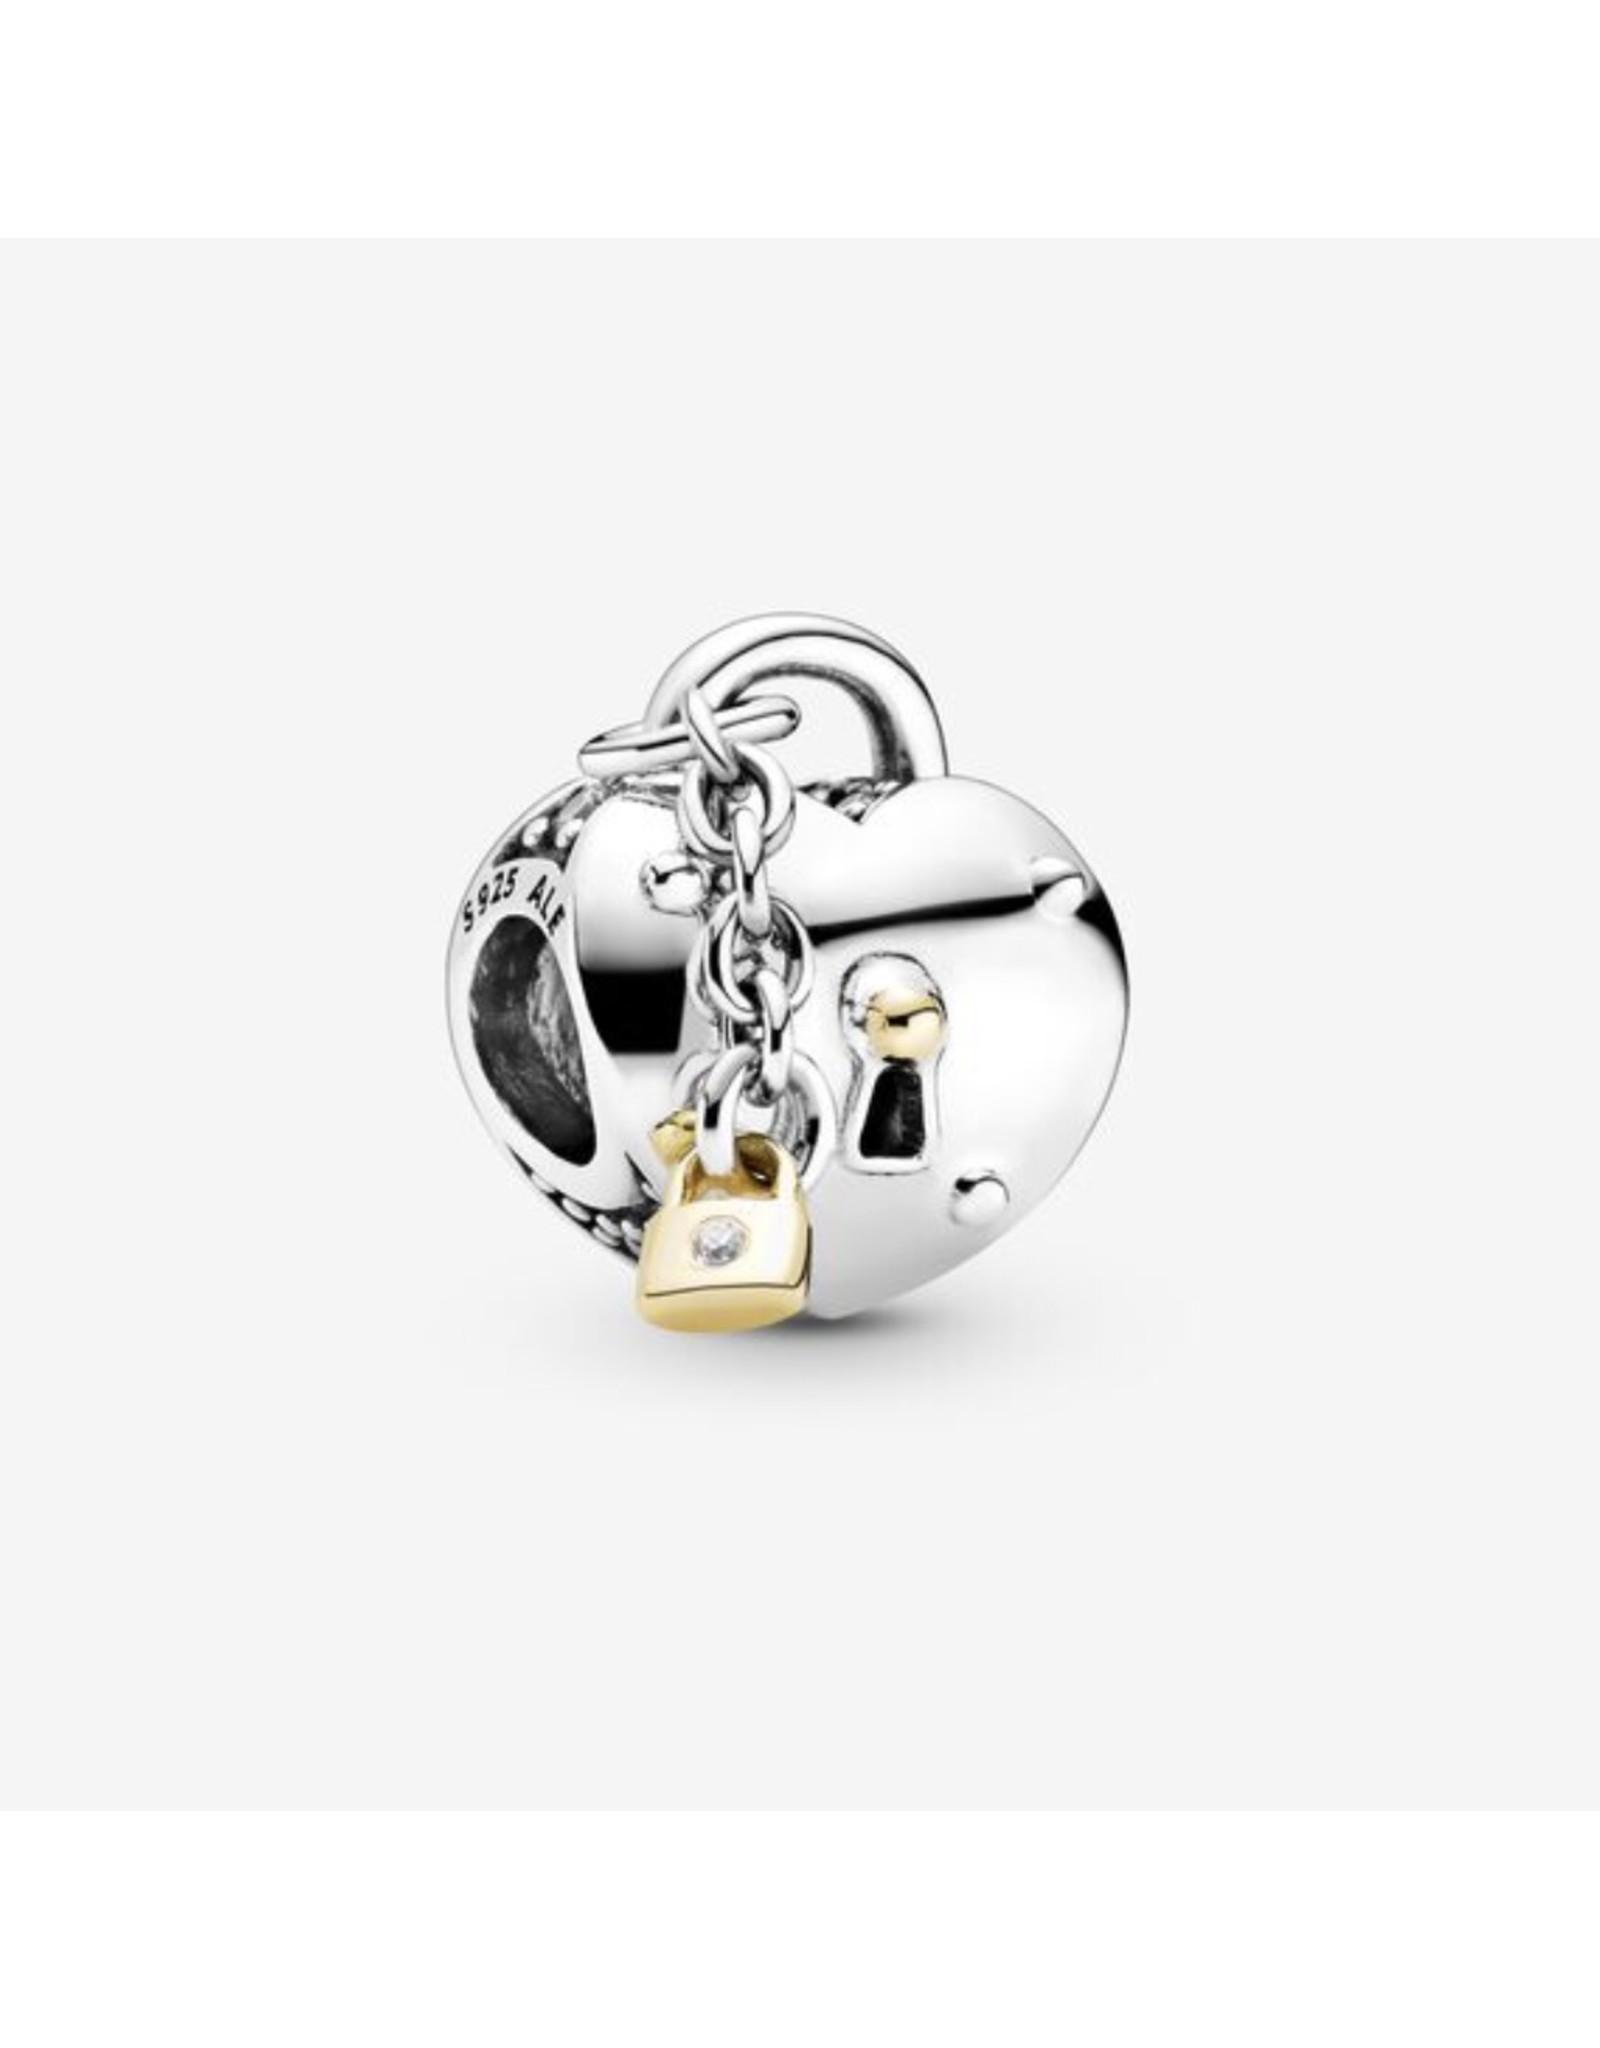 Pandora Pandora Charm,799160C01,Heart & Lock With 14K Gold